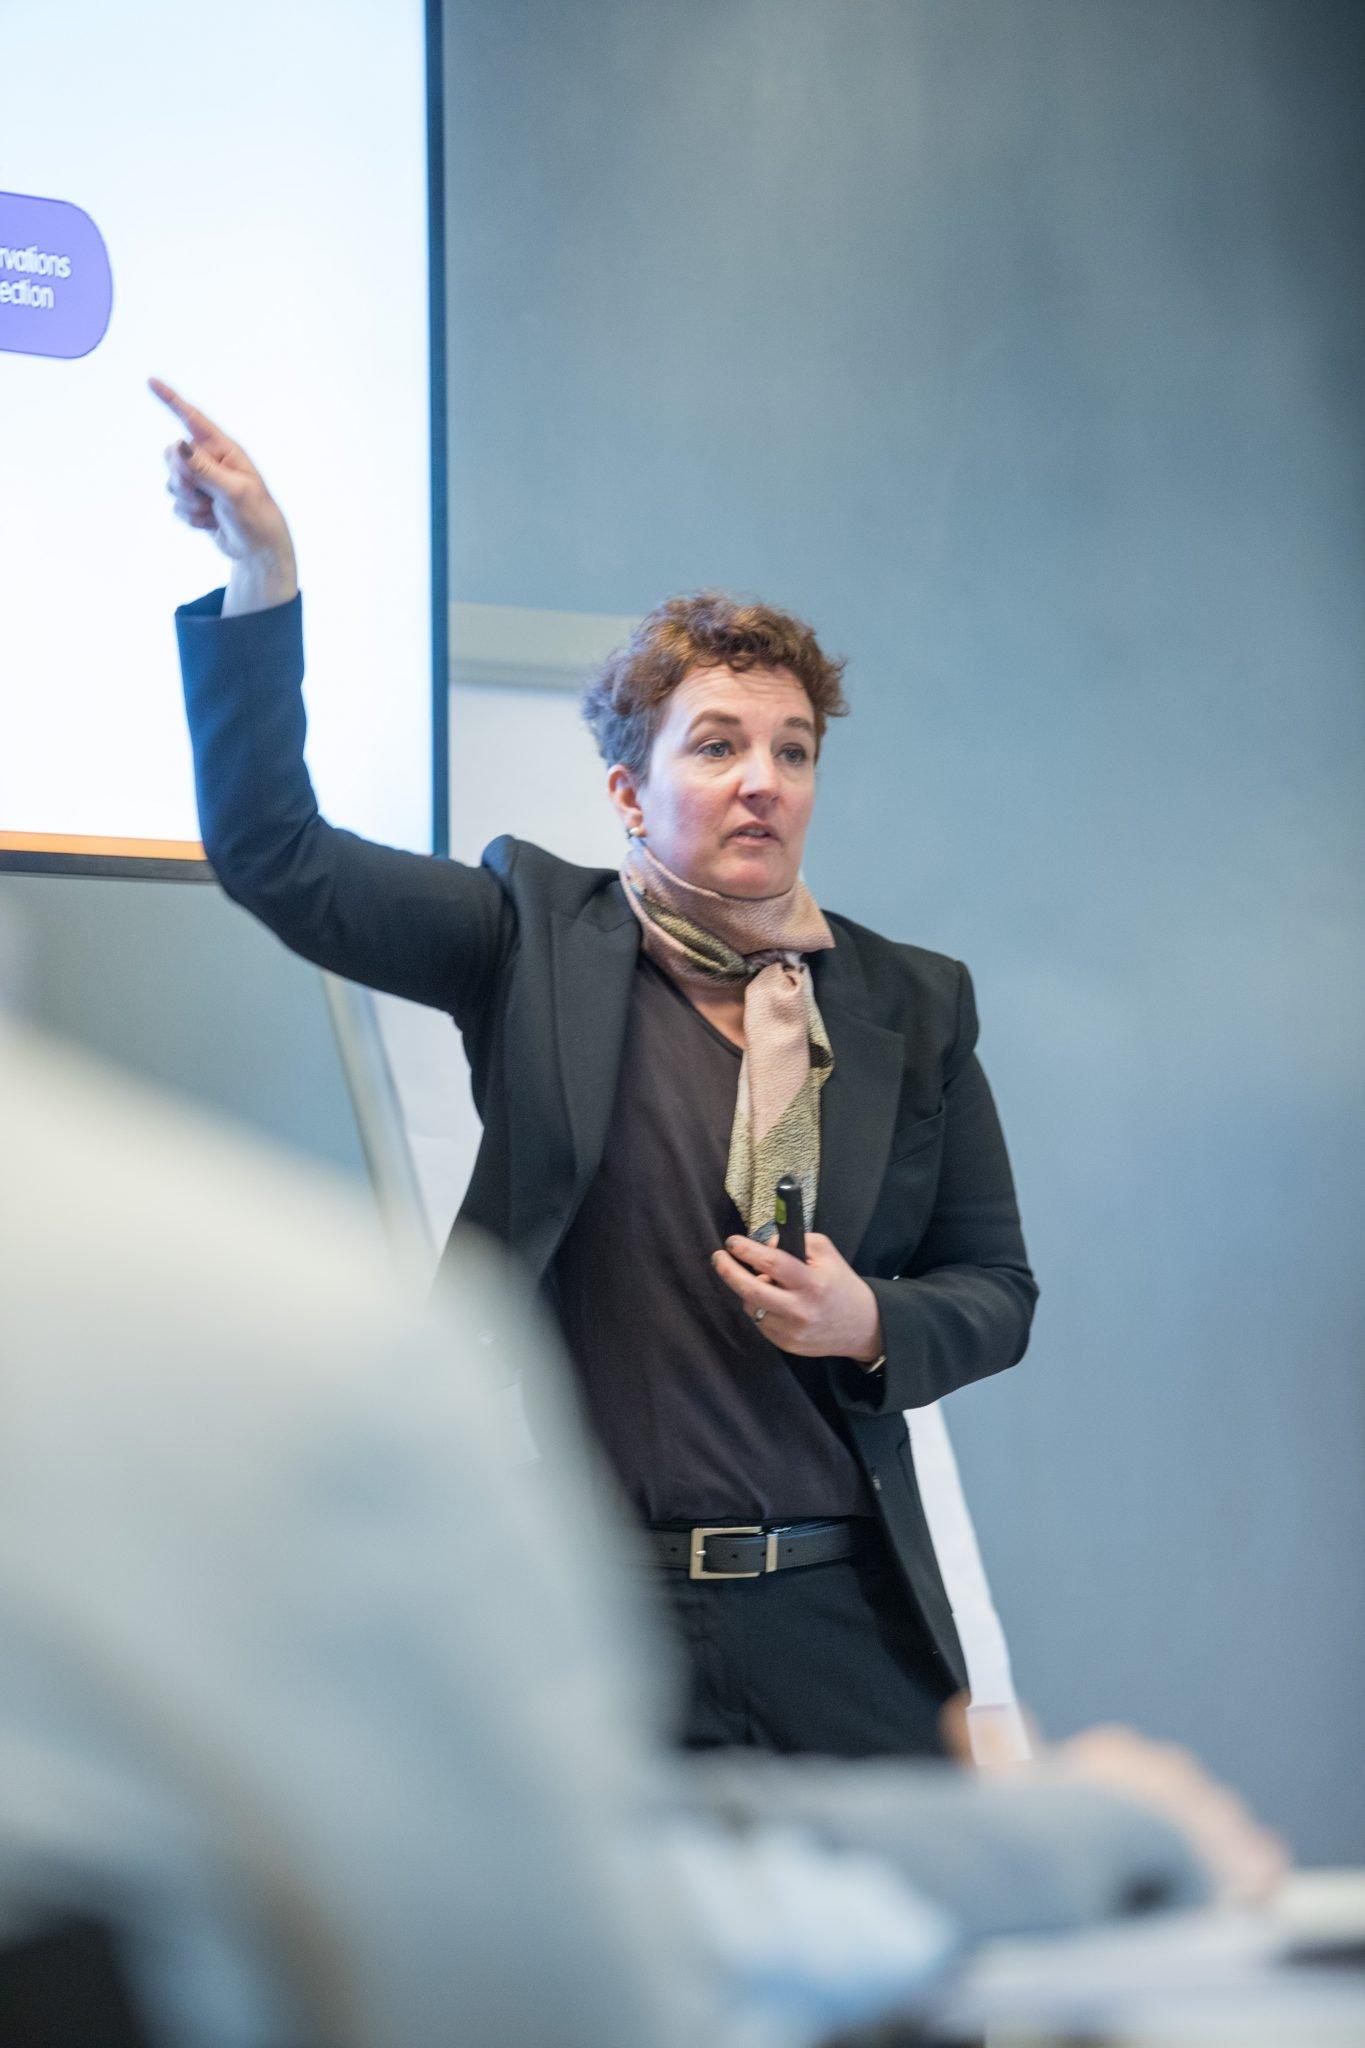 Judith Eberl - JuPantaRhei GmbH - LEARNING & ORGANISATIONAL ADVISORY